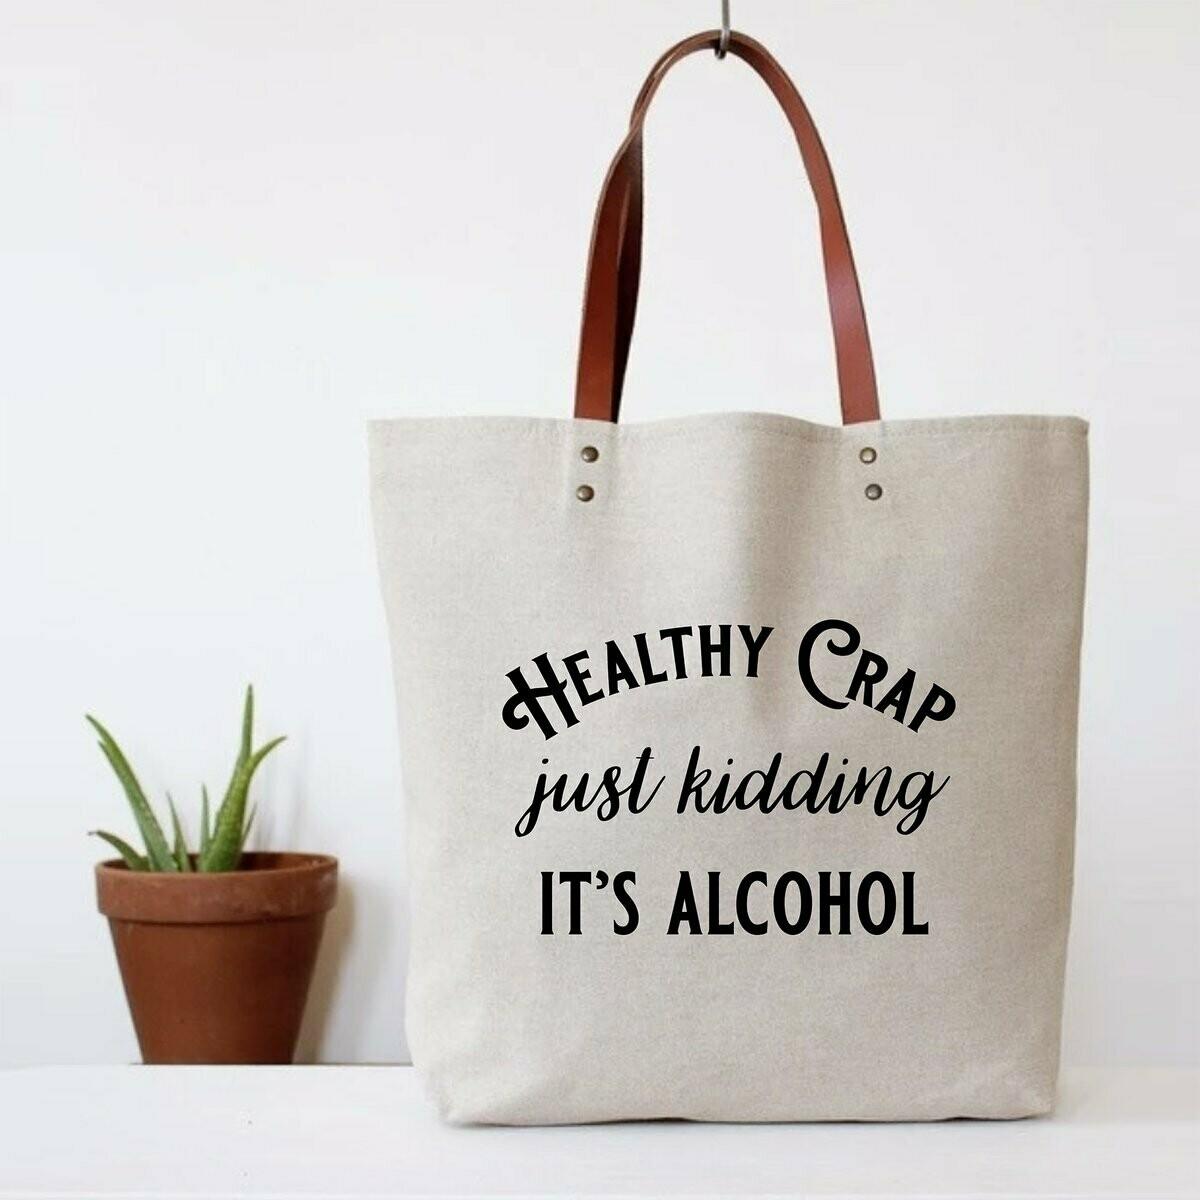 Fun Club Healthy Crap Tote Bag